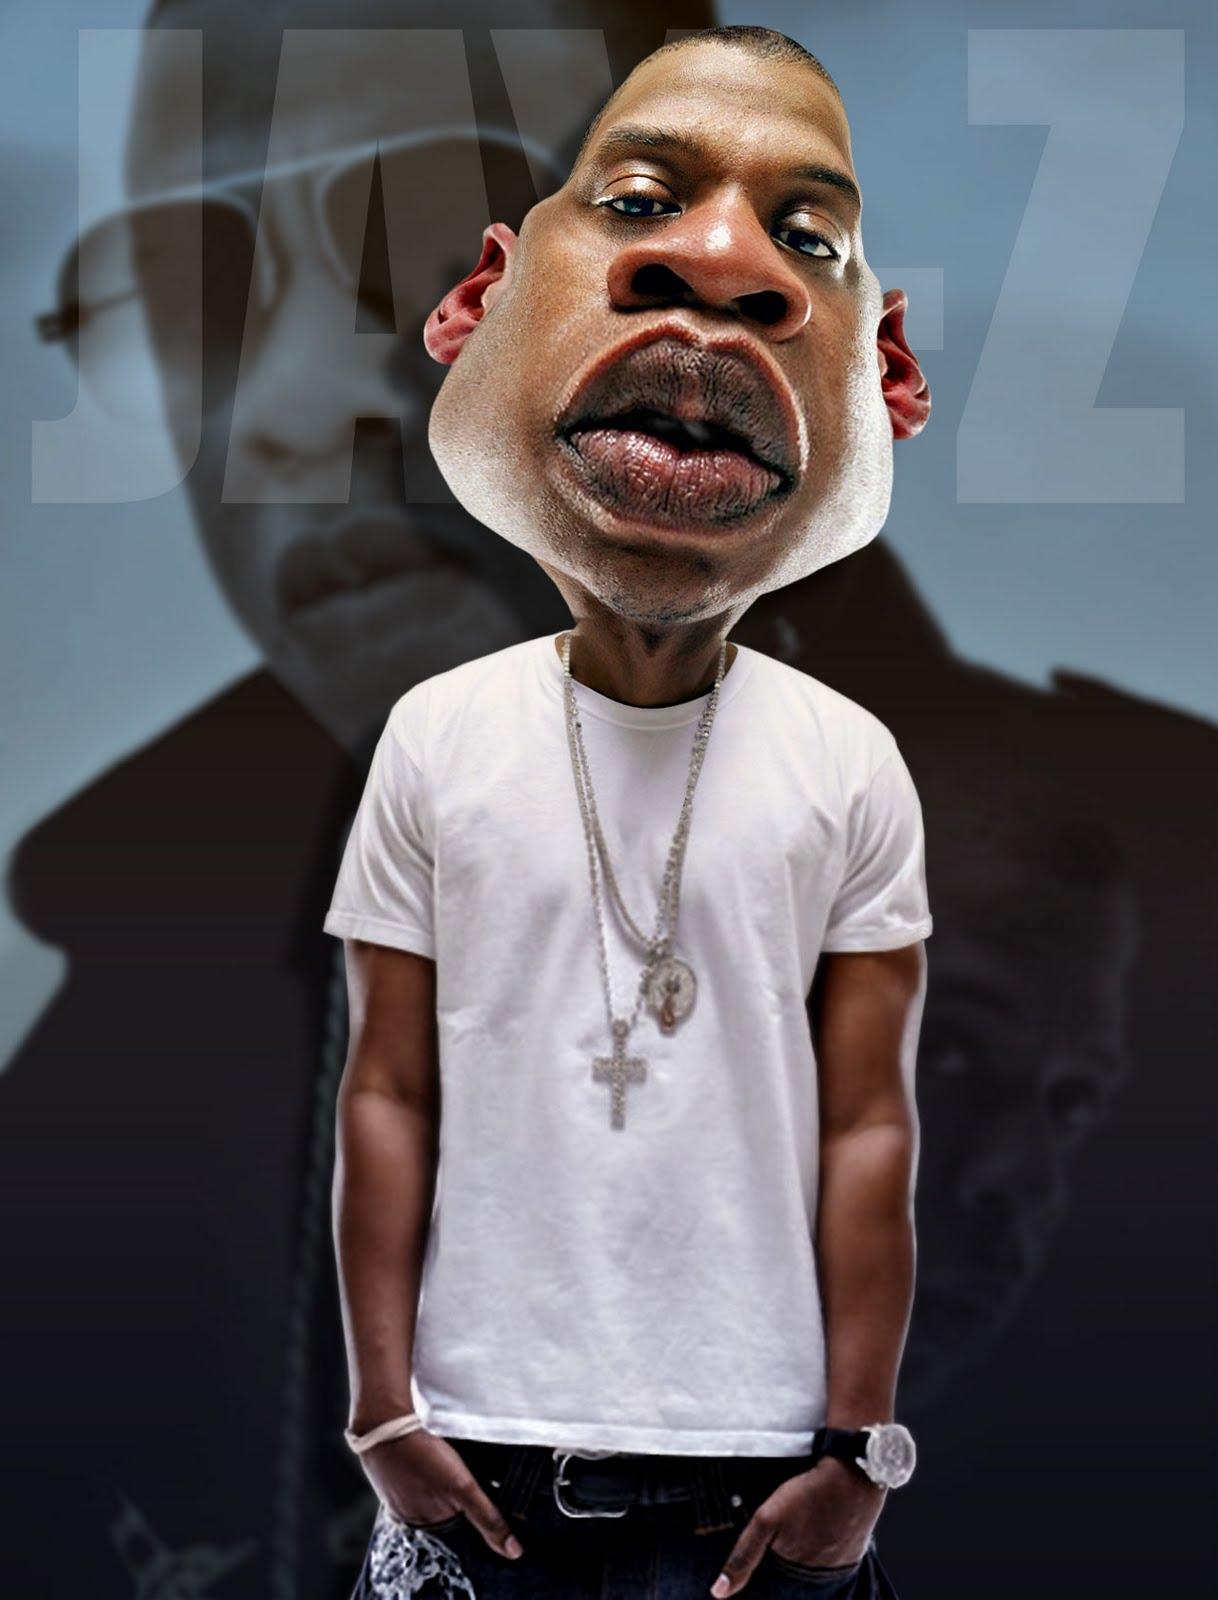 http://2.bp.blogspot.com/-Wmz9_XkSDTs/TZ5o4BjppUI/AAAAAAAABWA/yd6nbaQXfCo/s1600/Jay-Z_II.jpg